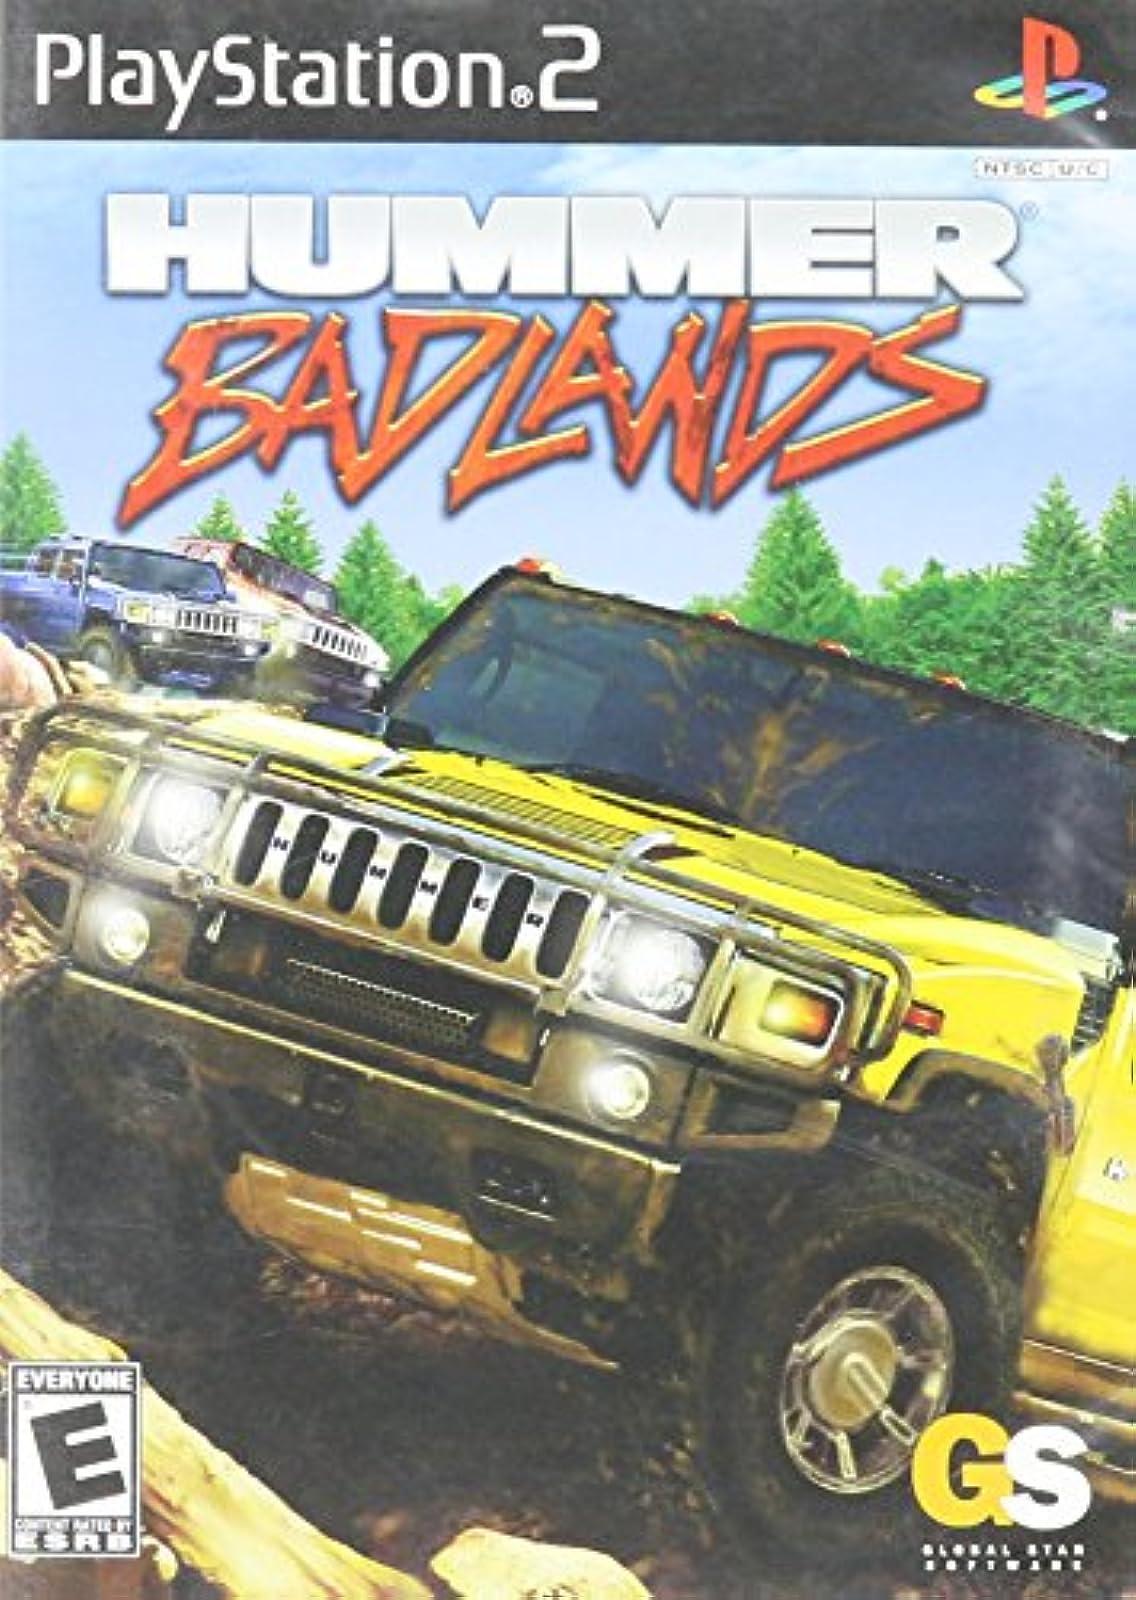 Hummer Badlands For PlayStation 2 PS2 Racing